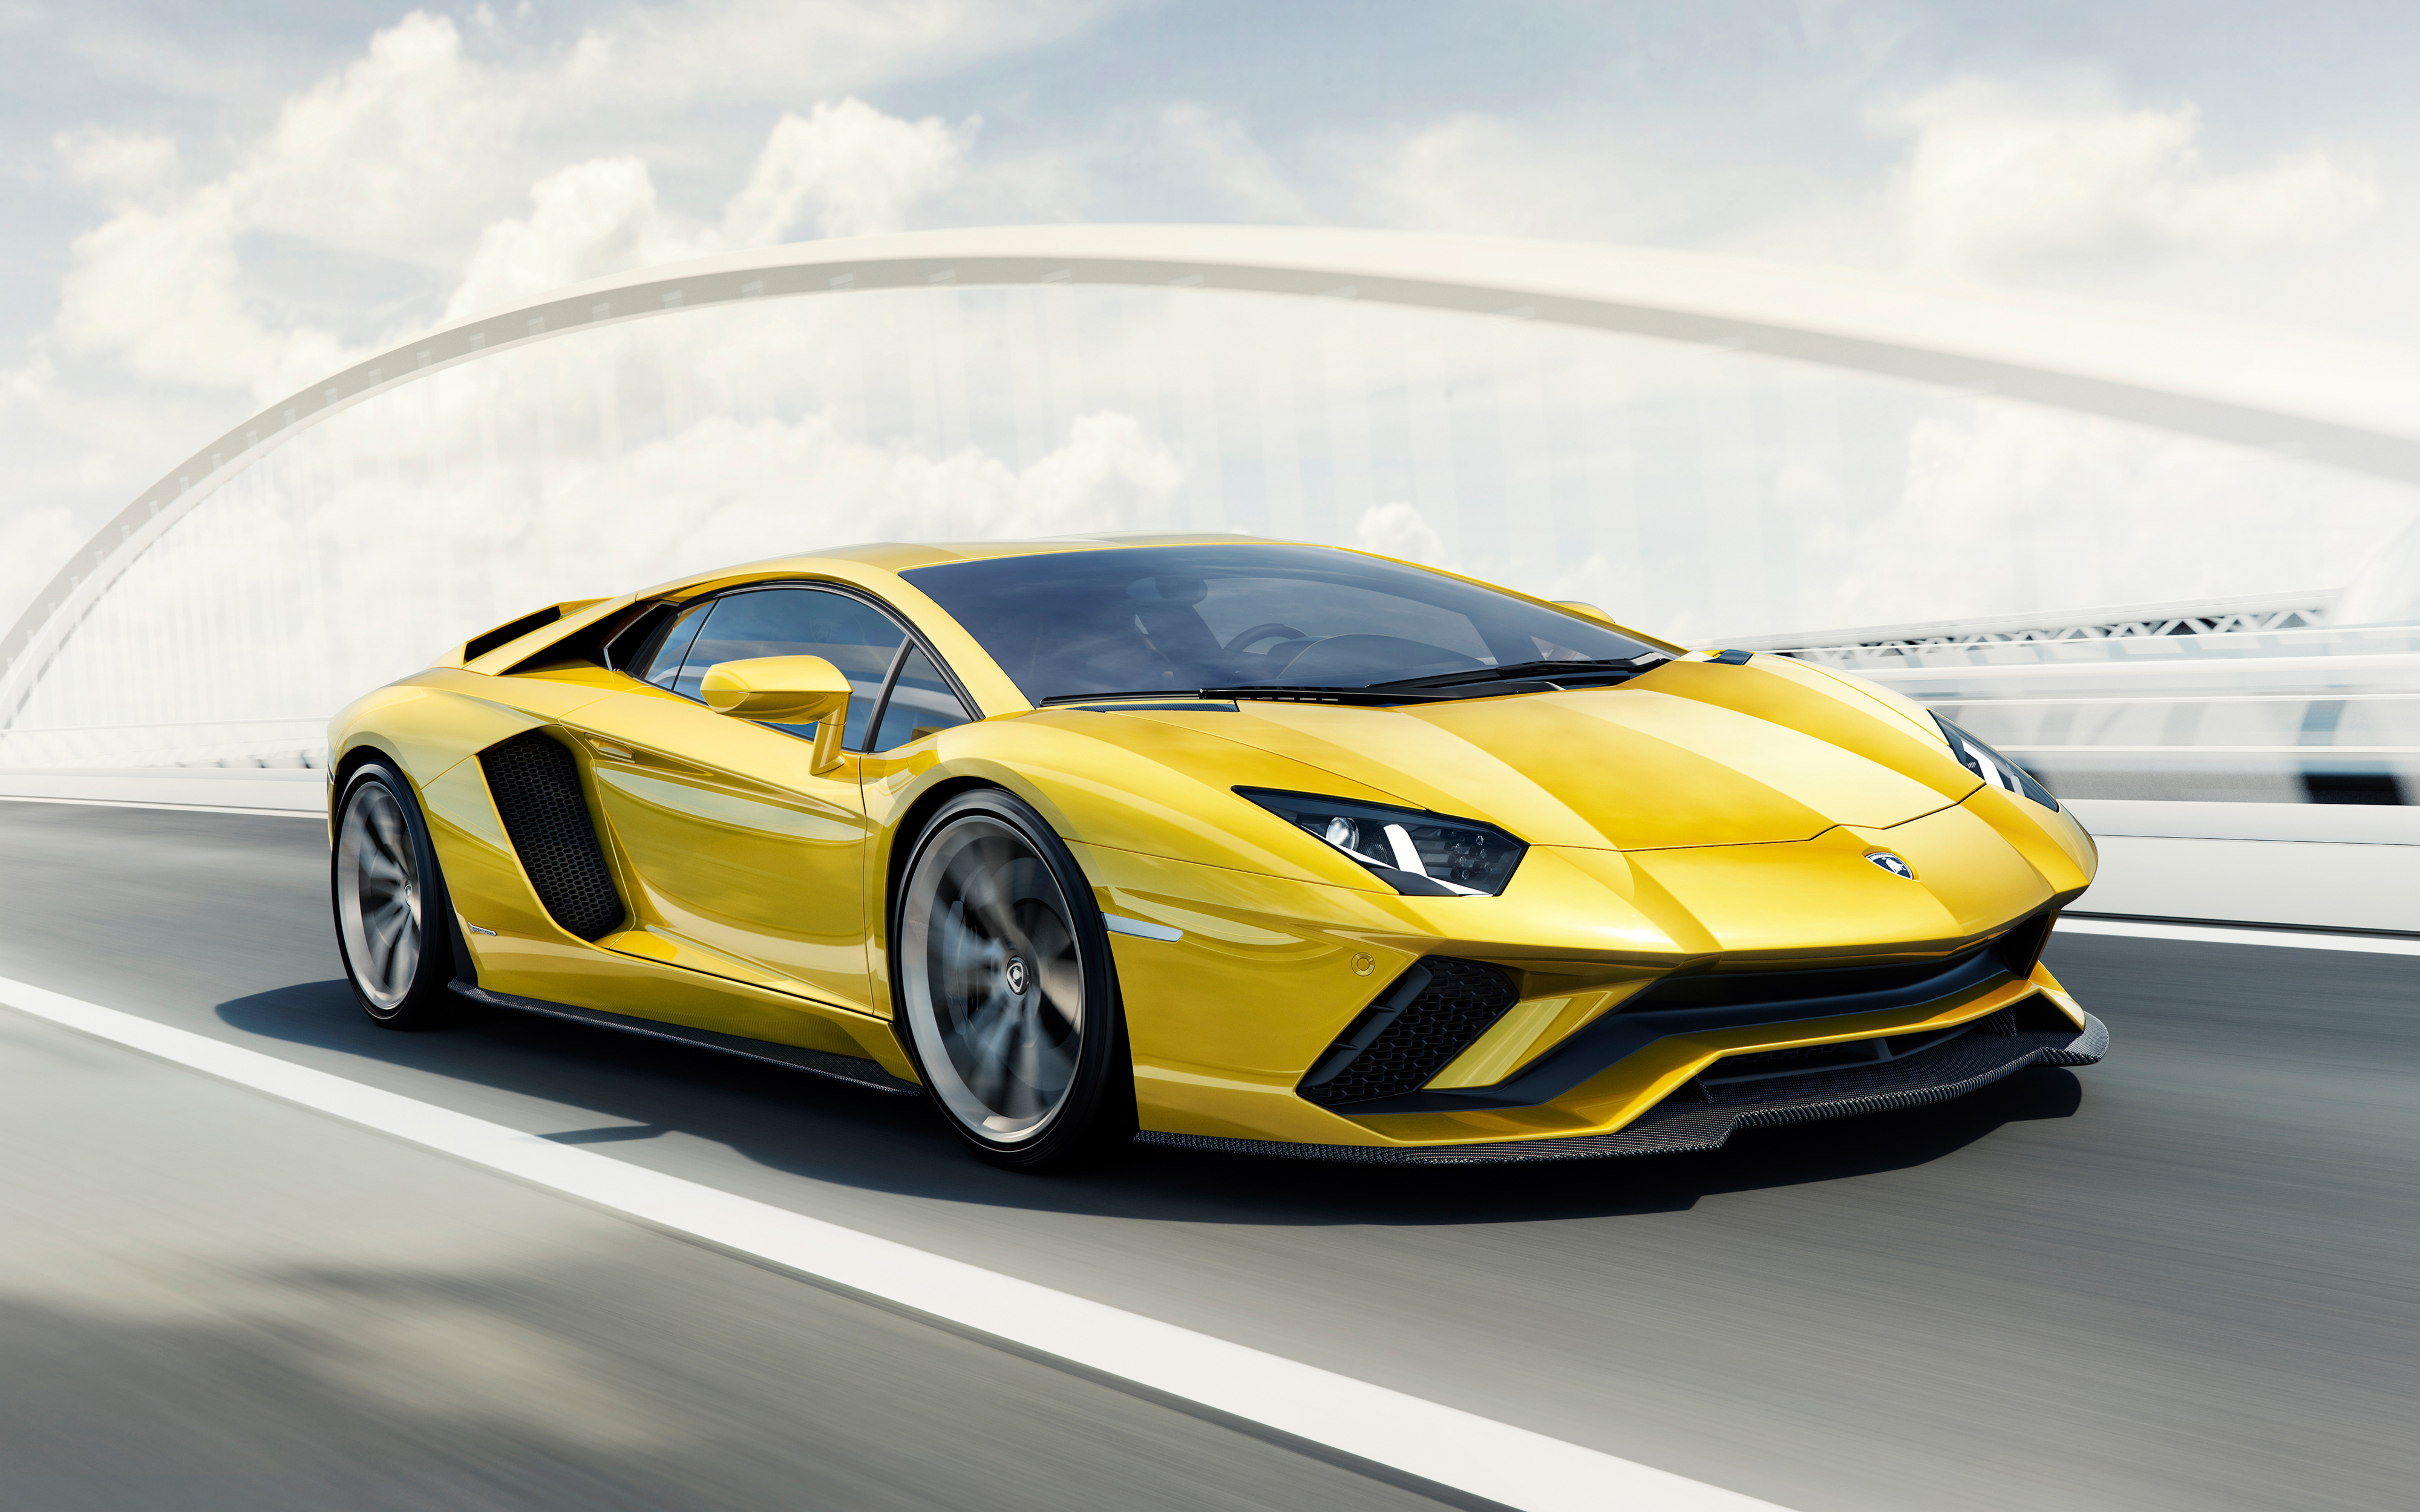 Lamborghini Aventador S 4K